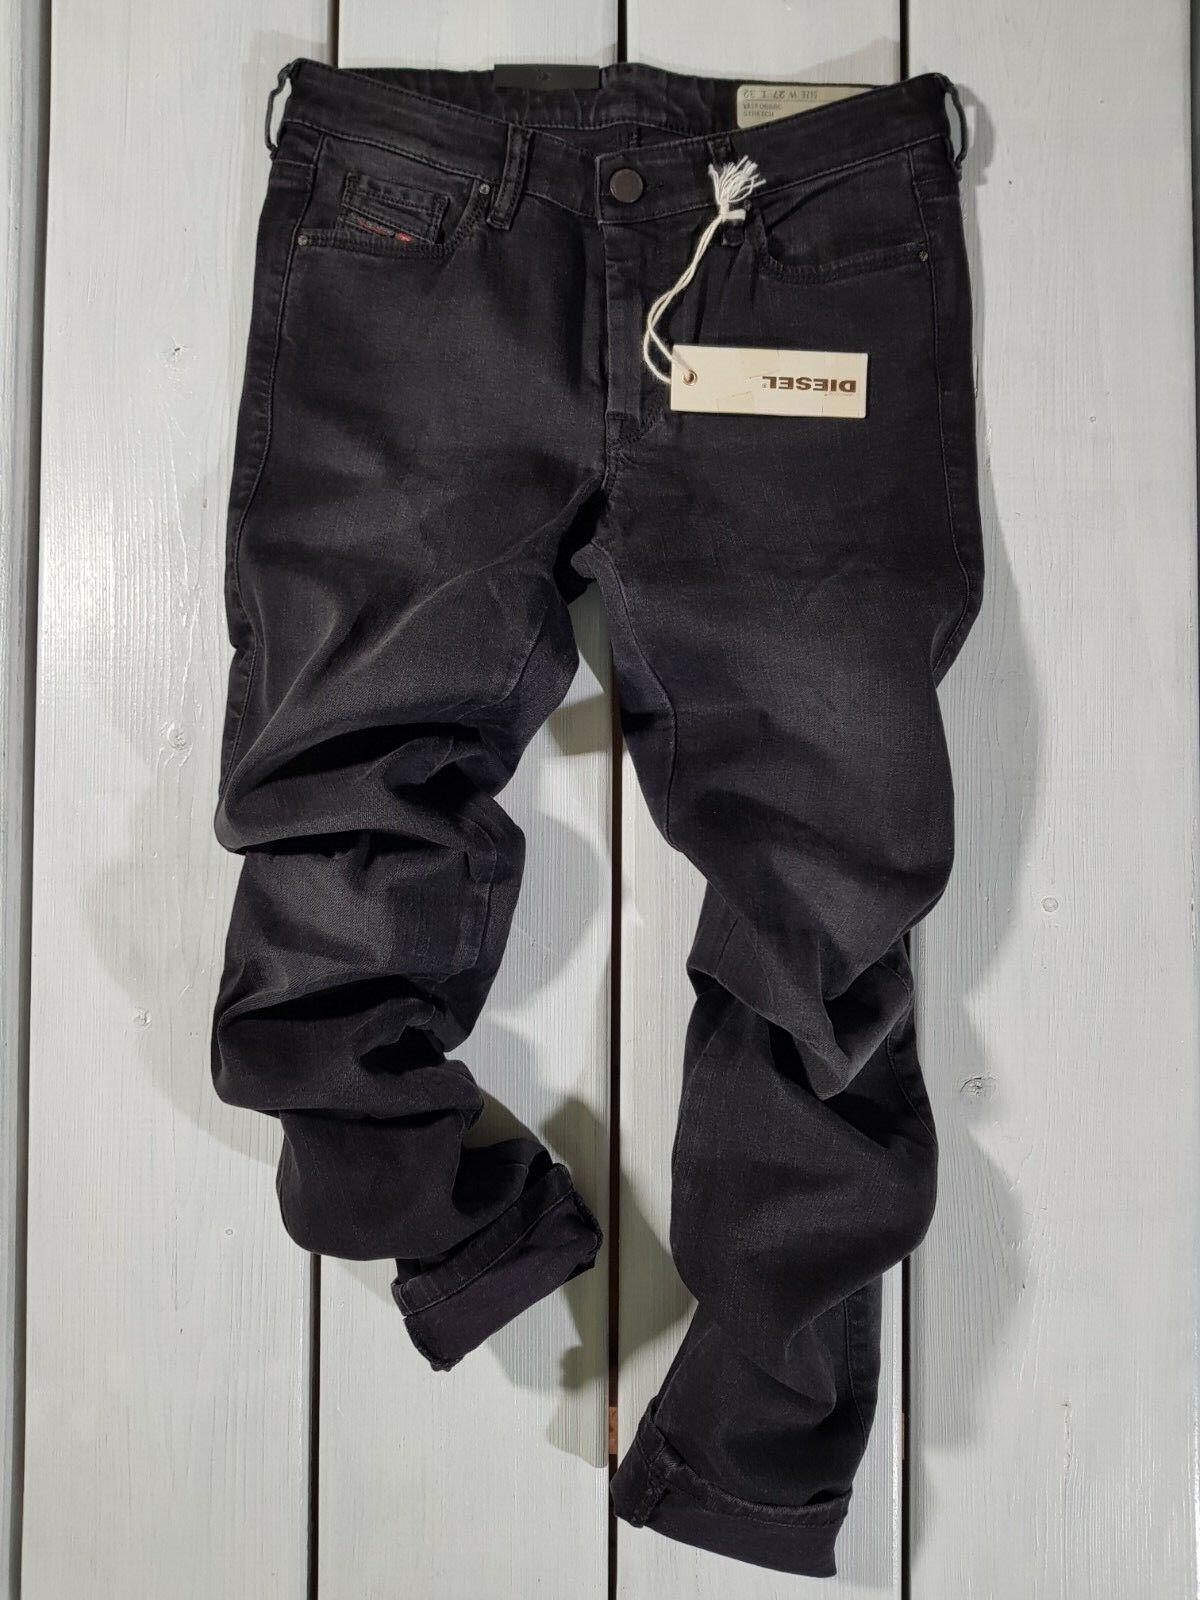 Neu Diesel DAMEN Jeans Doris 0668c Supereng Skinny Regular Größe